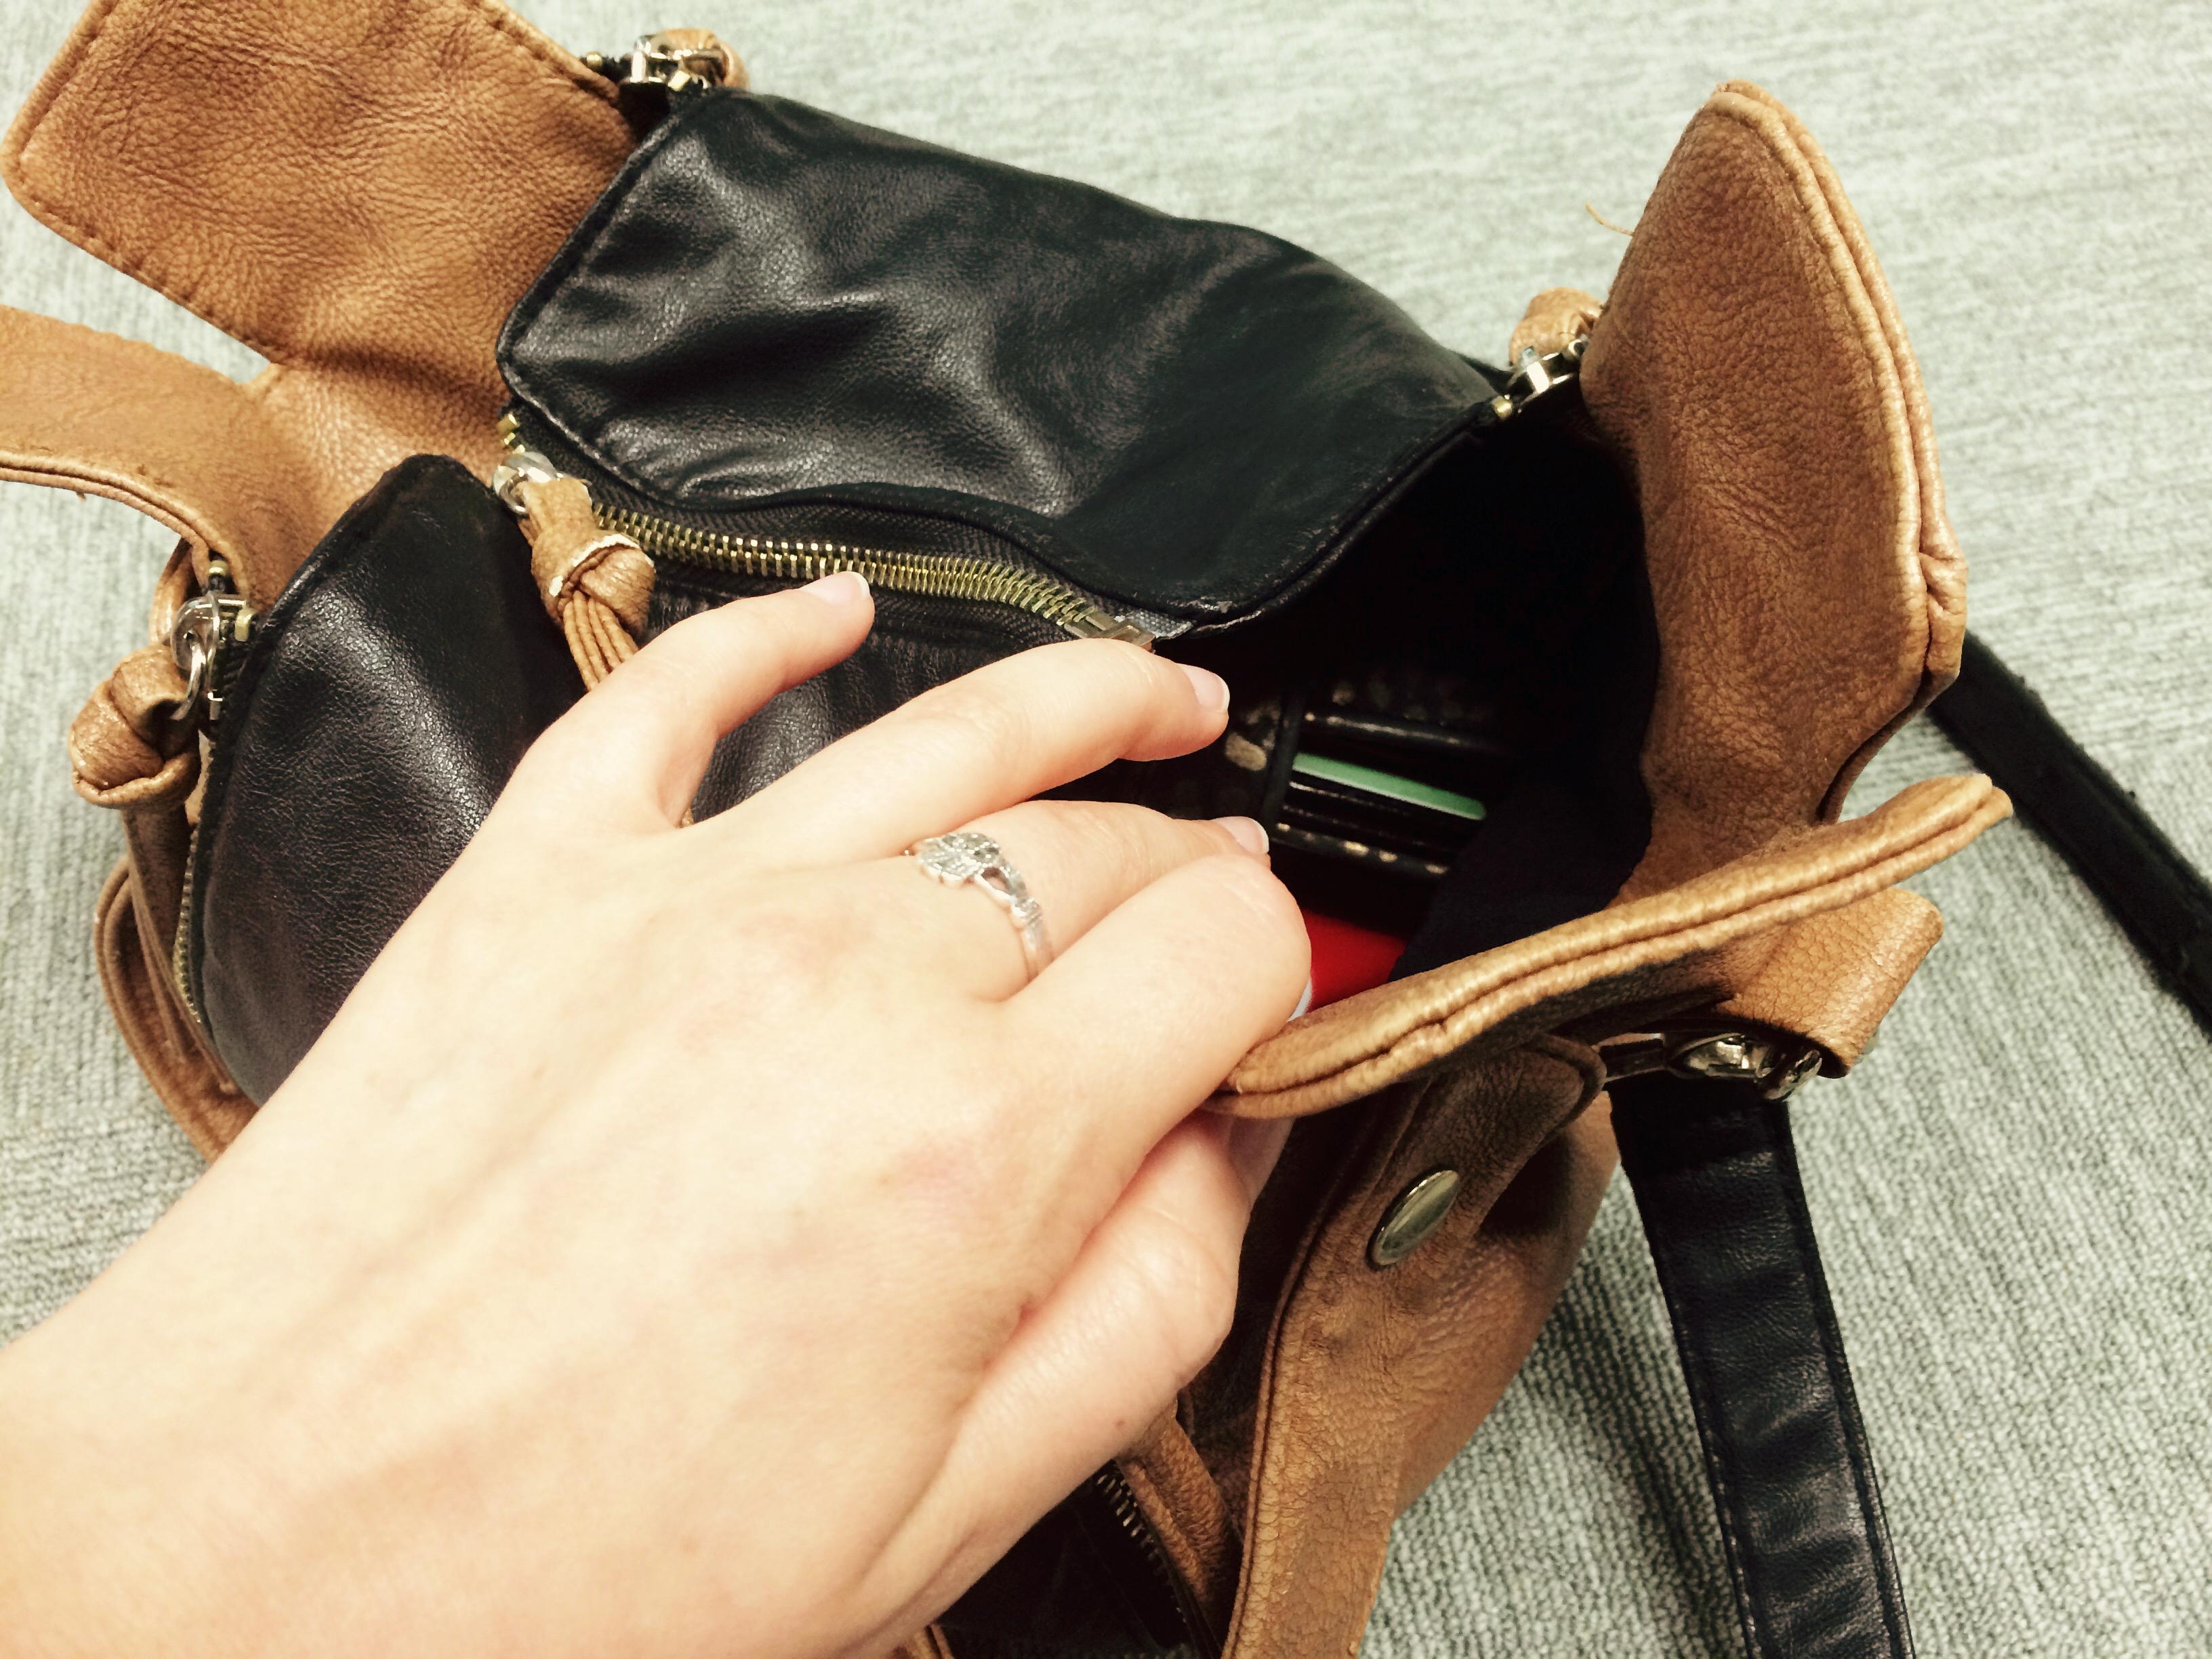 Tess' handbag